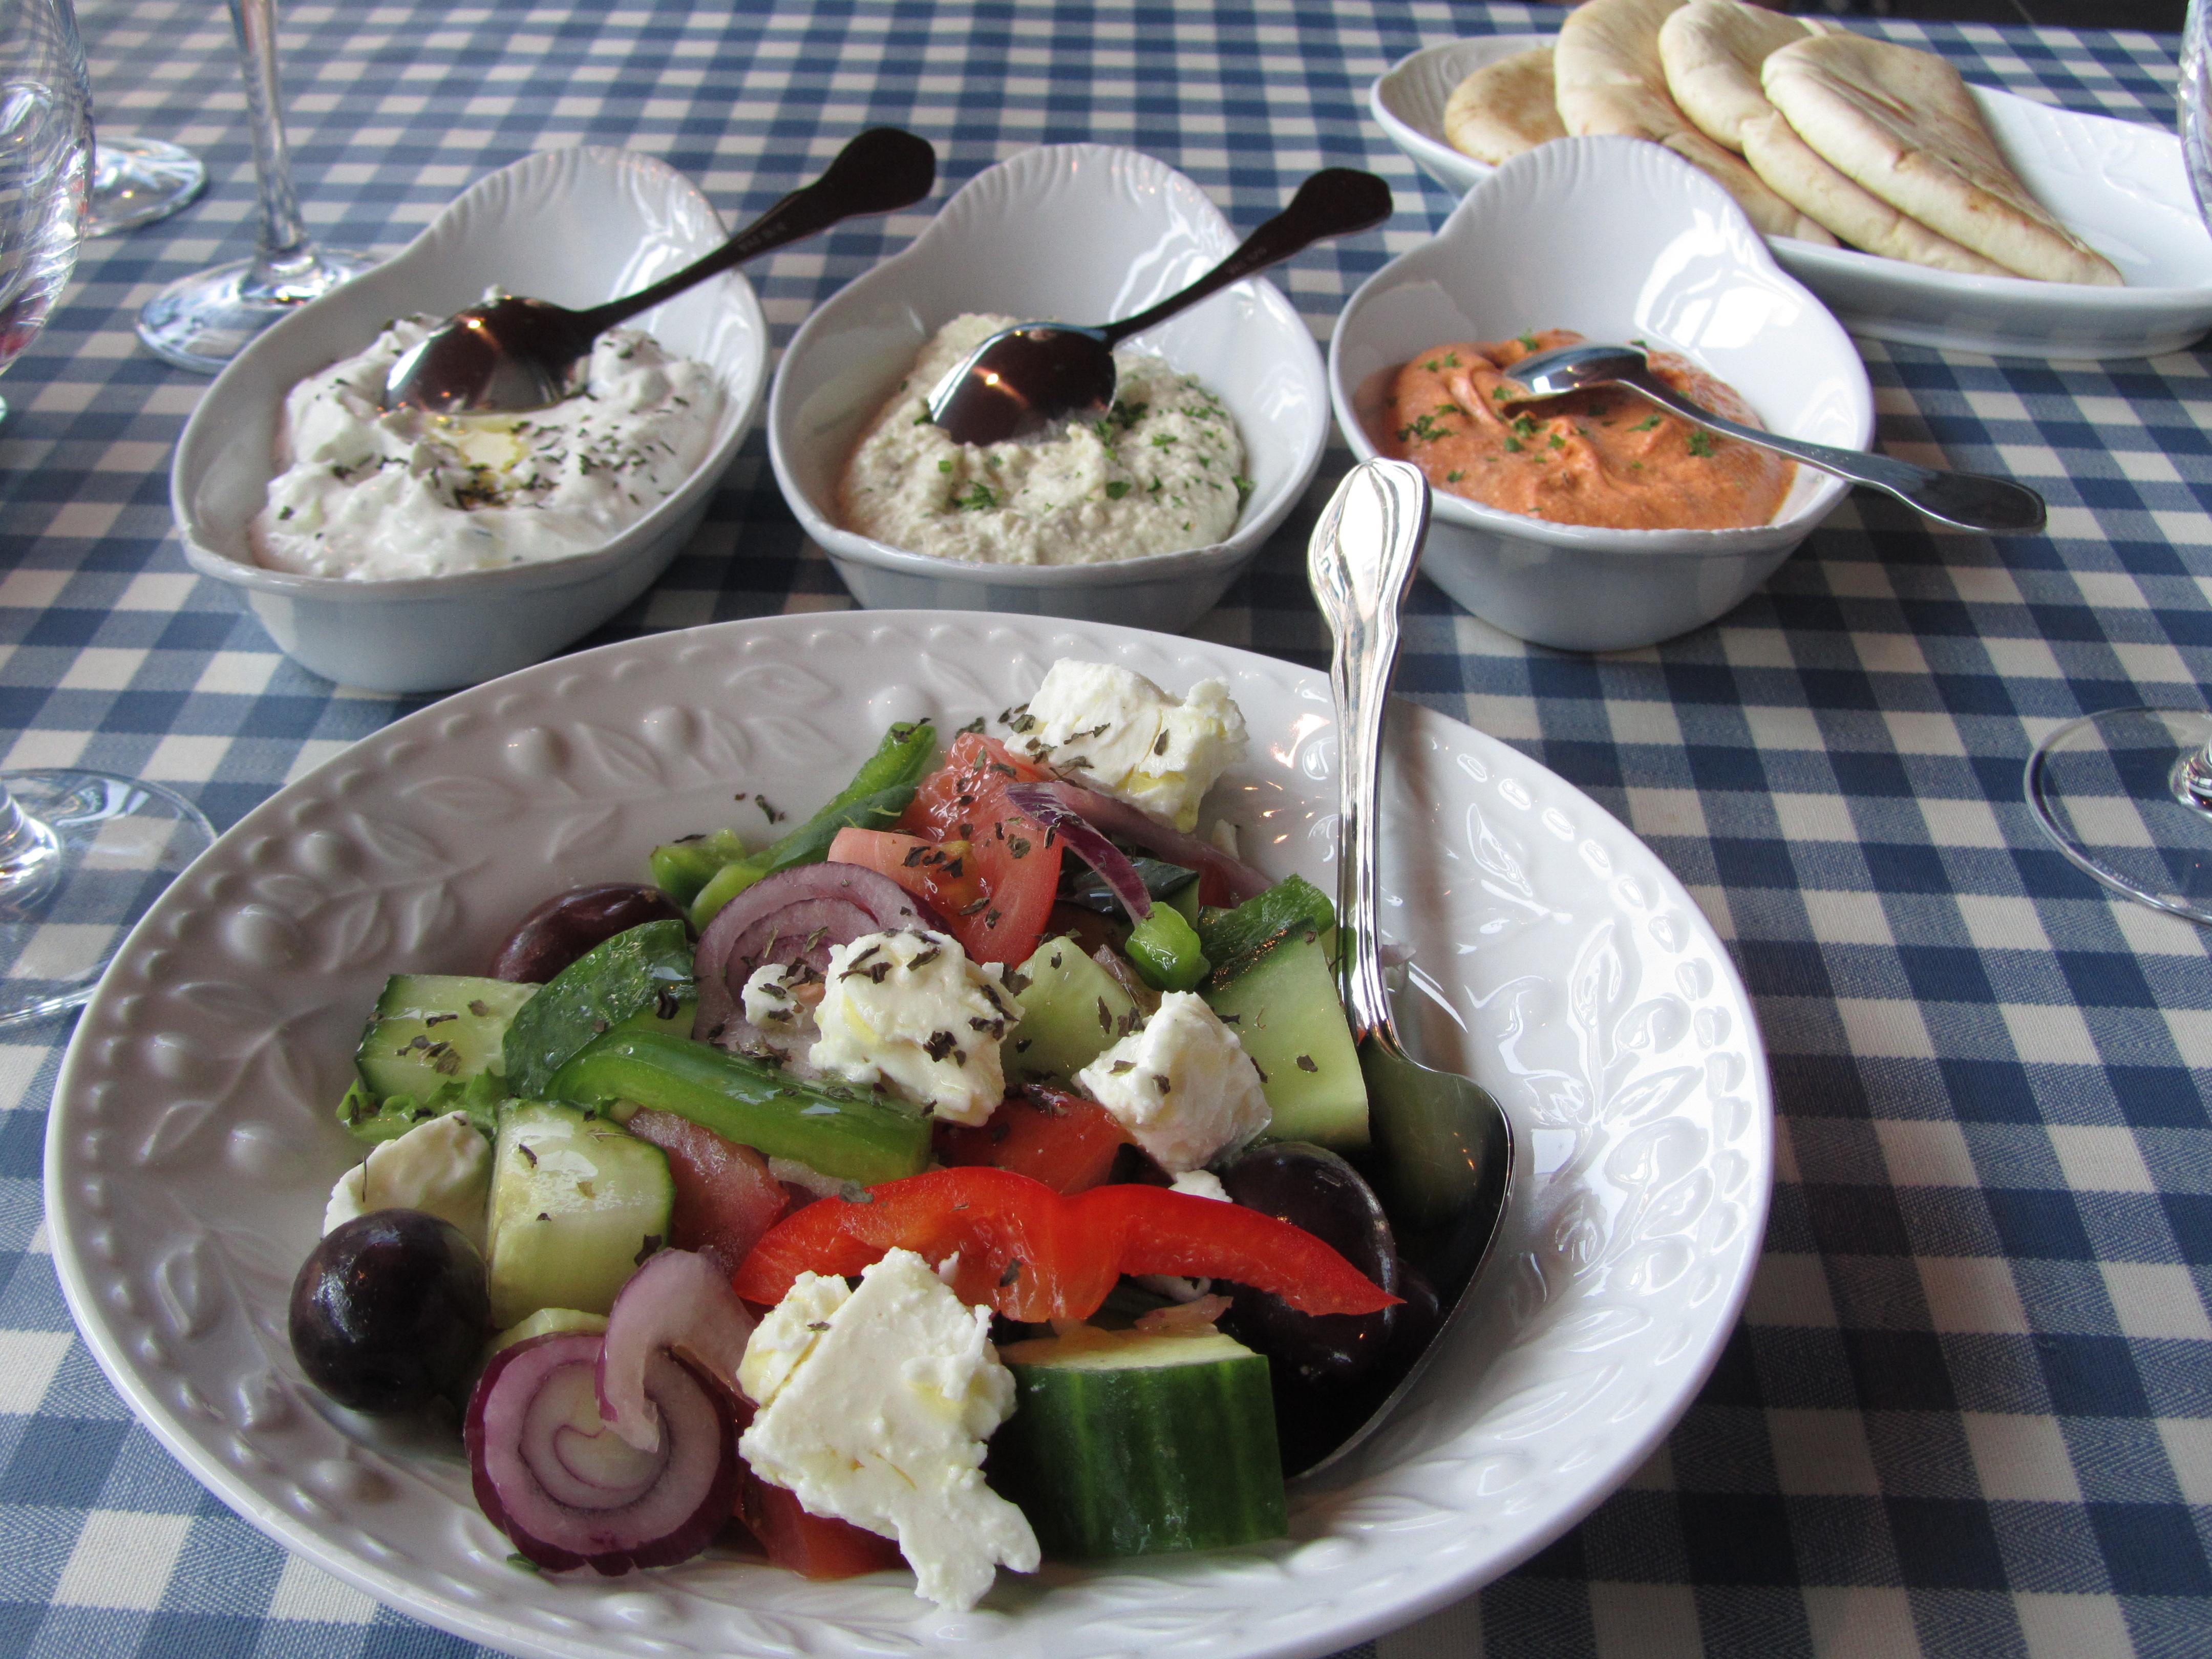 Ravintola Kreeta, Joensuu: Meze-ateria kahdelle, ensimmäiset alkupalat